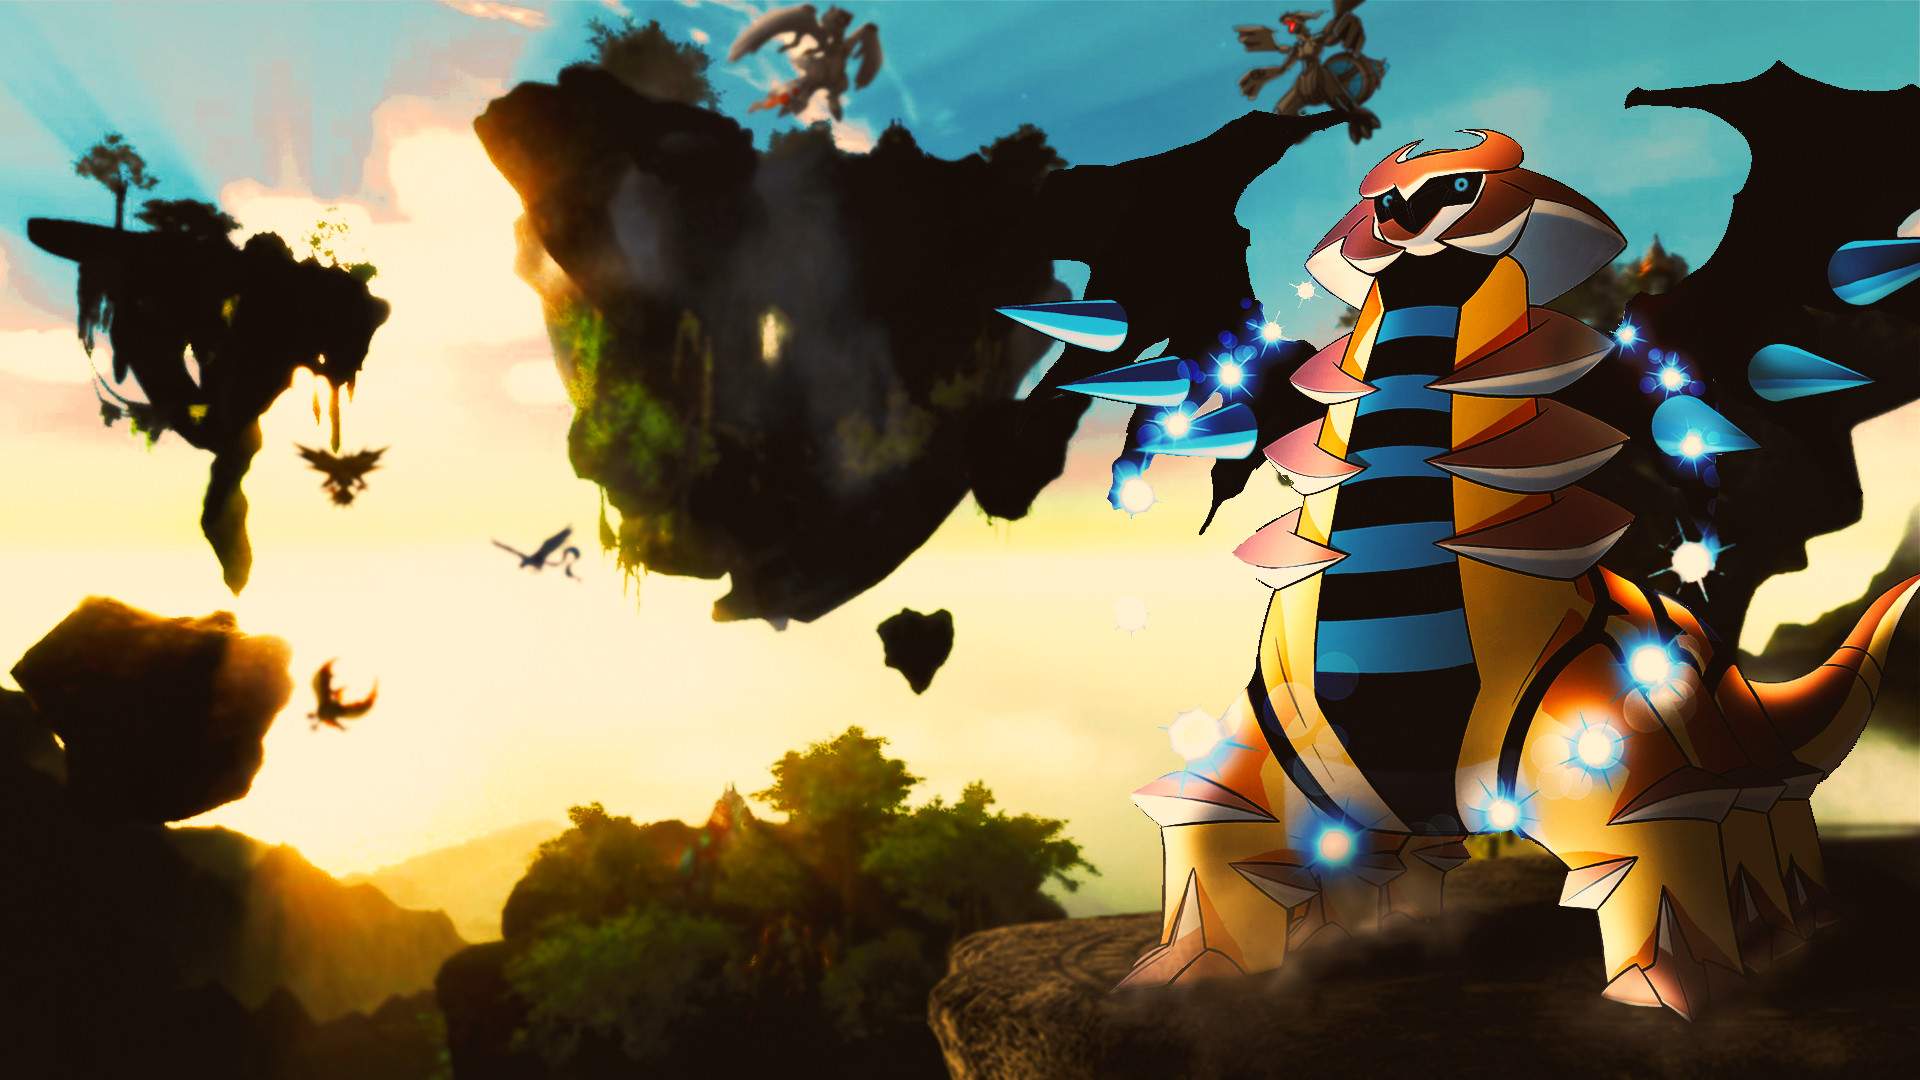 Shiny Pokemon Wallpaper (76+ images)